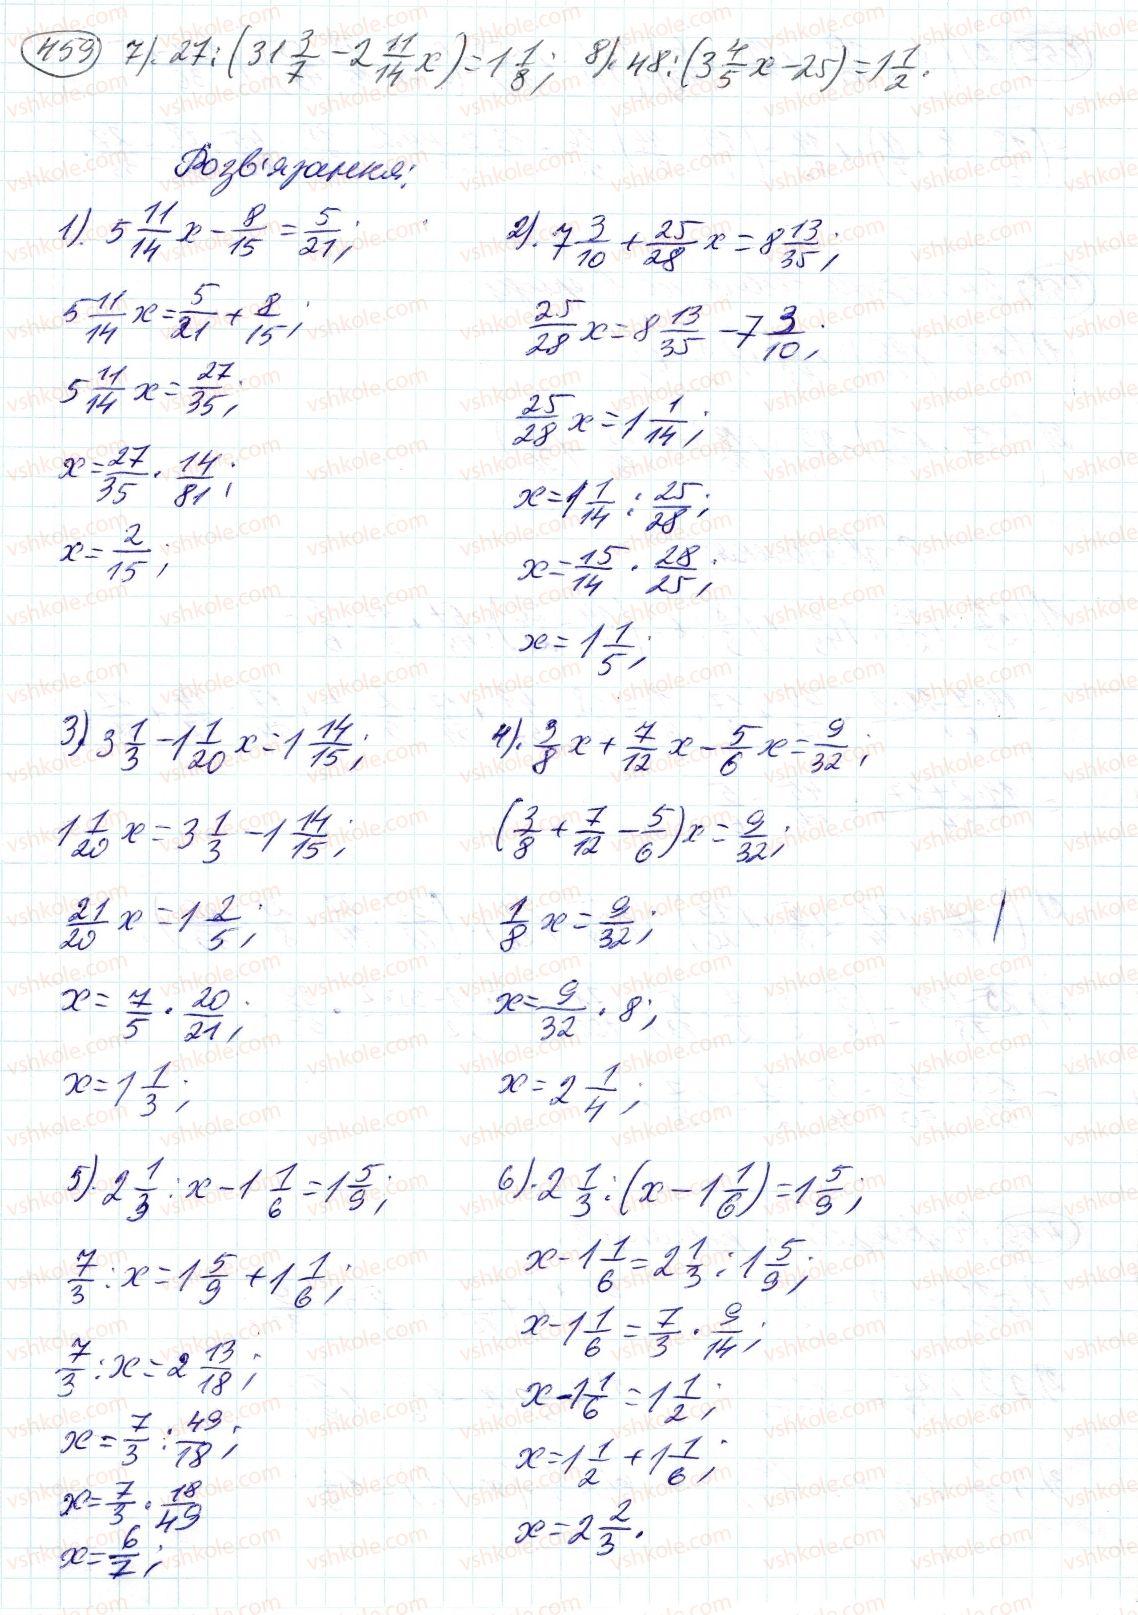 6-matematika-ag-merzlyak-vb-polonskij-ms-yakir-2014--2-zvichajni-drobi-14-dilennya-drobiv-459-rnd1077.jpg